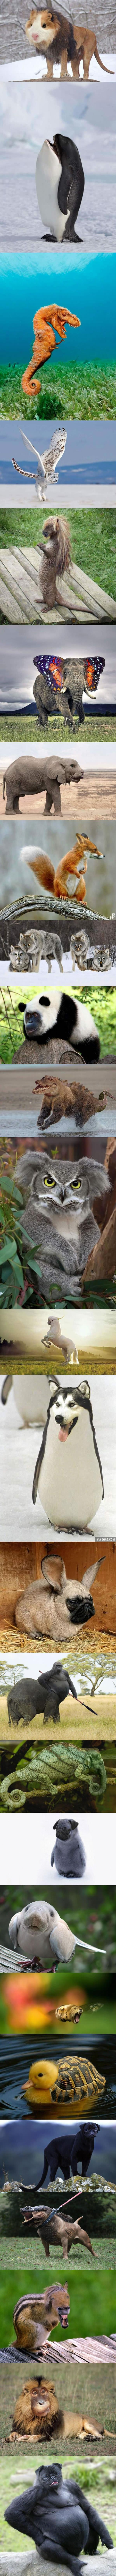 Photoshop Animal Hybrids